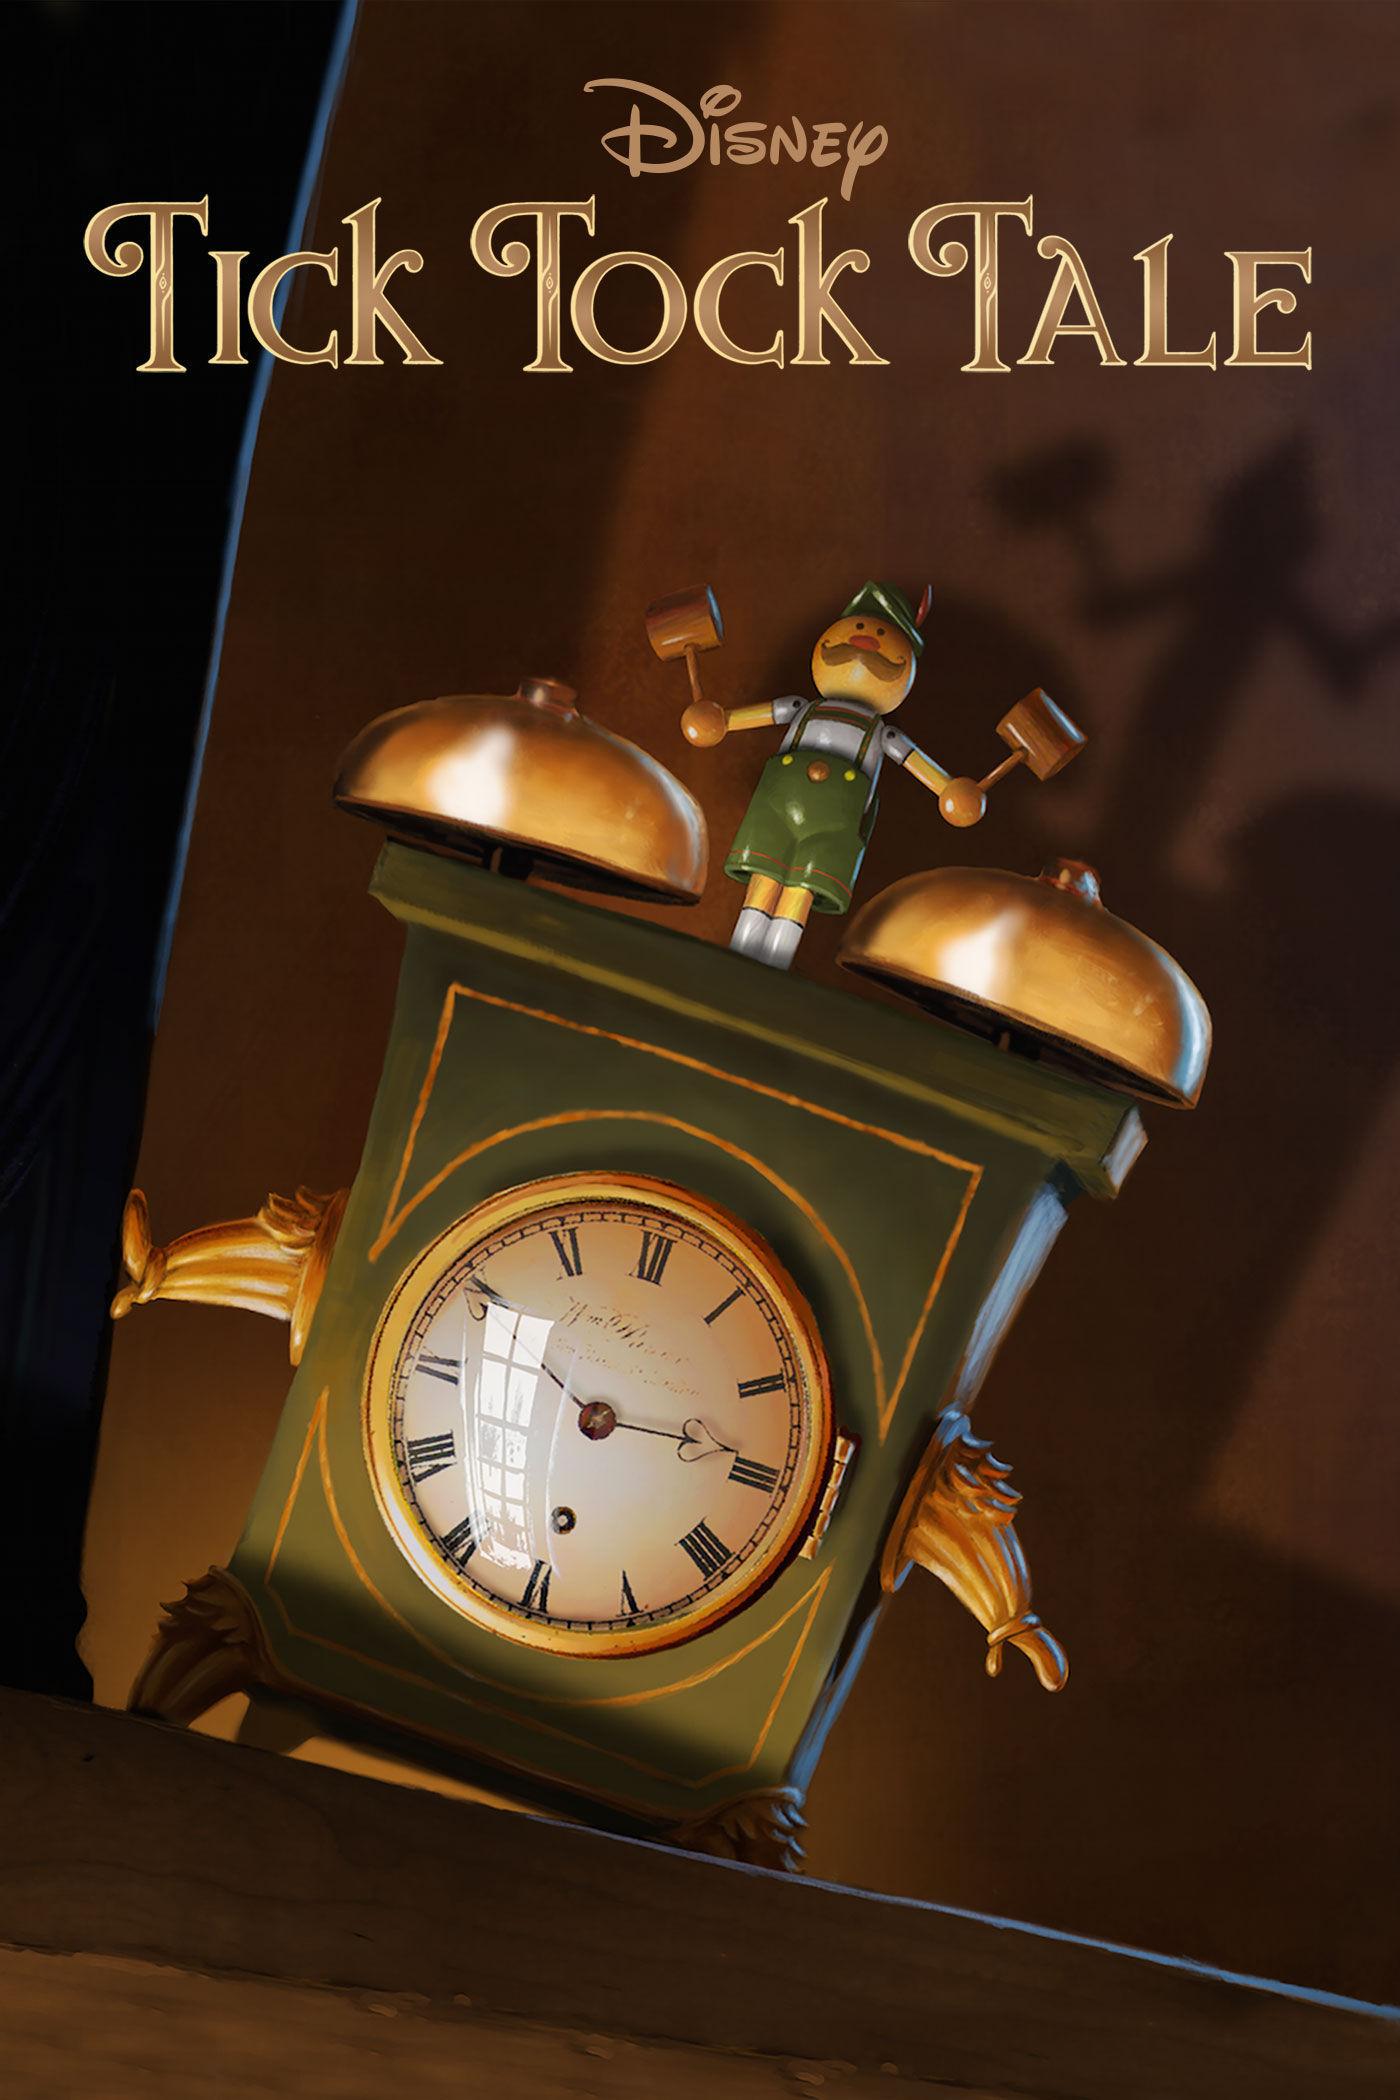 Tick Tock Tale Disney Wiki Fandom Powered By Wikia # Muebles Tic Toc